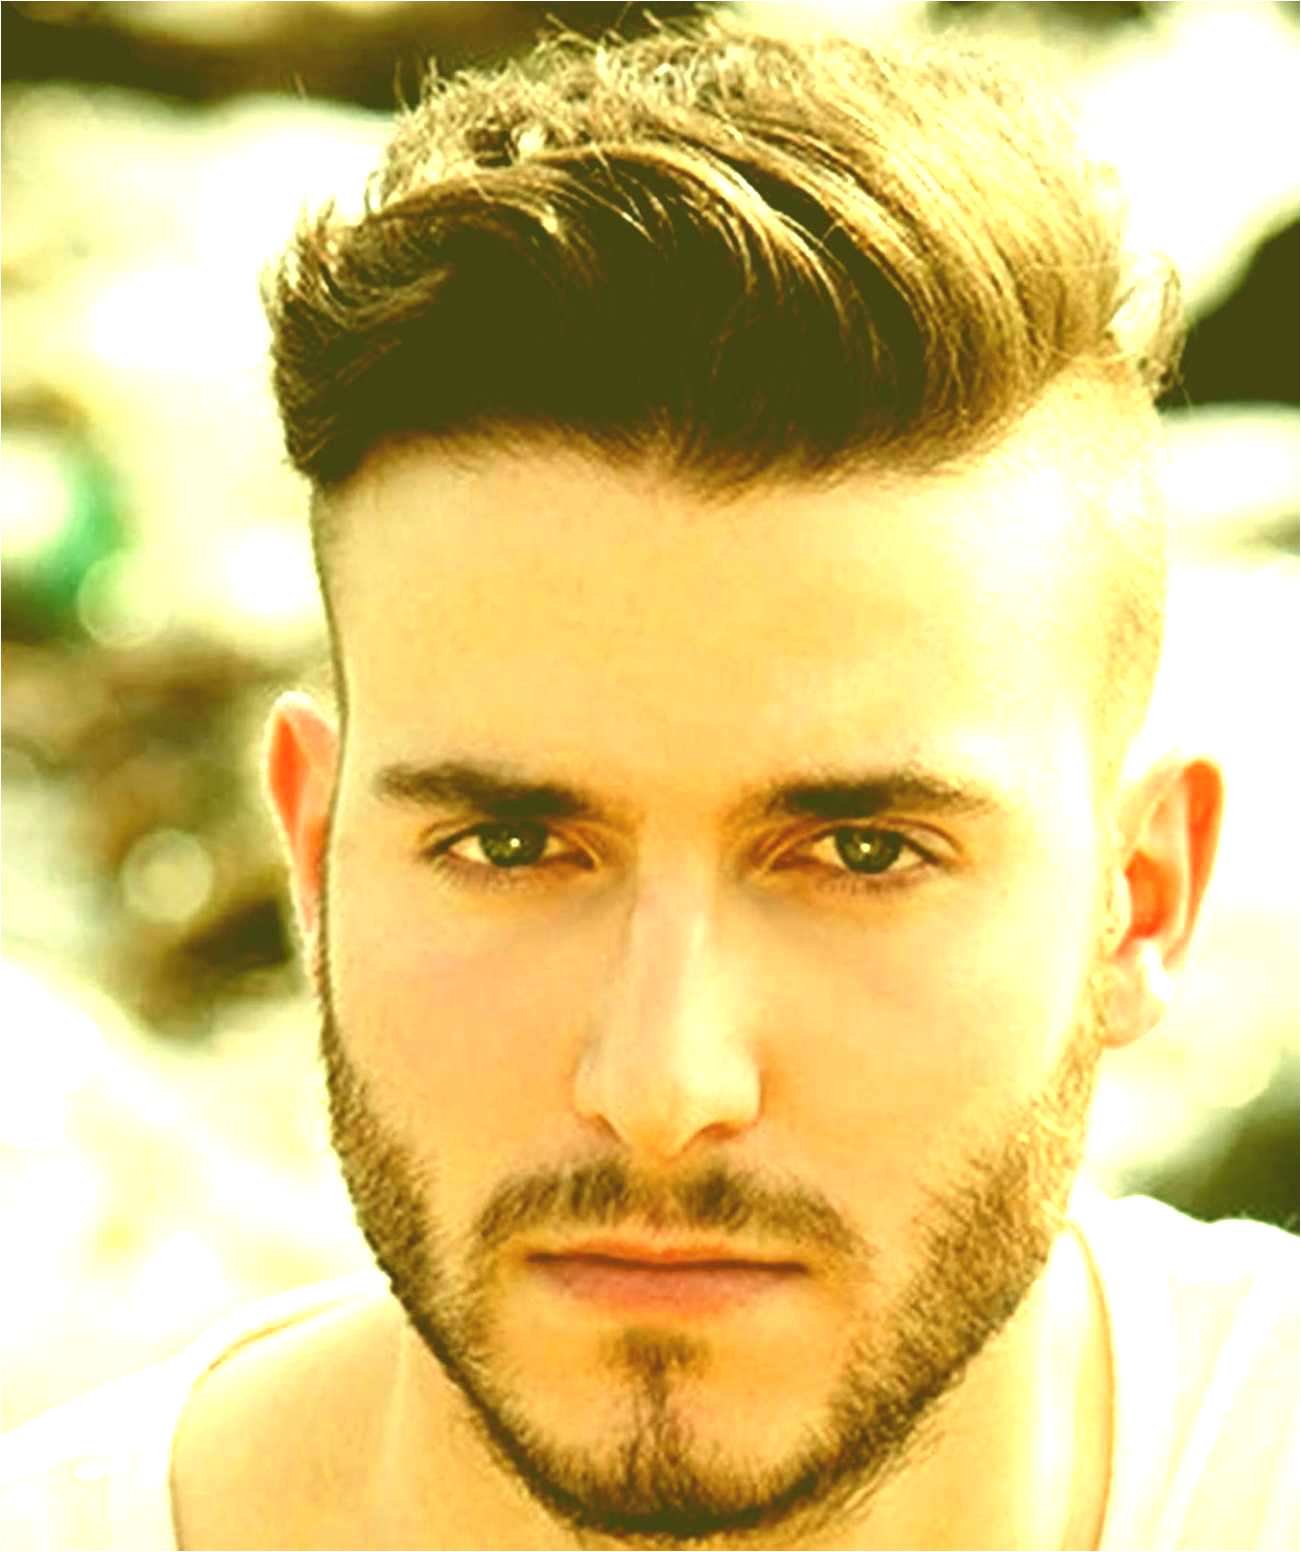 Undercut Hairstyles for Long Hair Luxury top Haircuts for Men Short Hairstyles for Men New Hairstyles